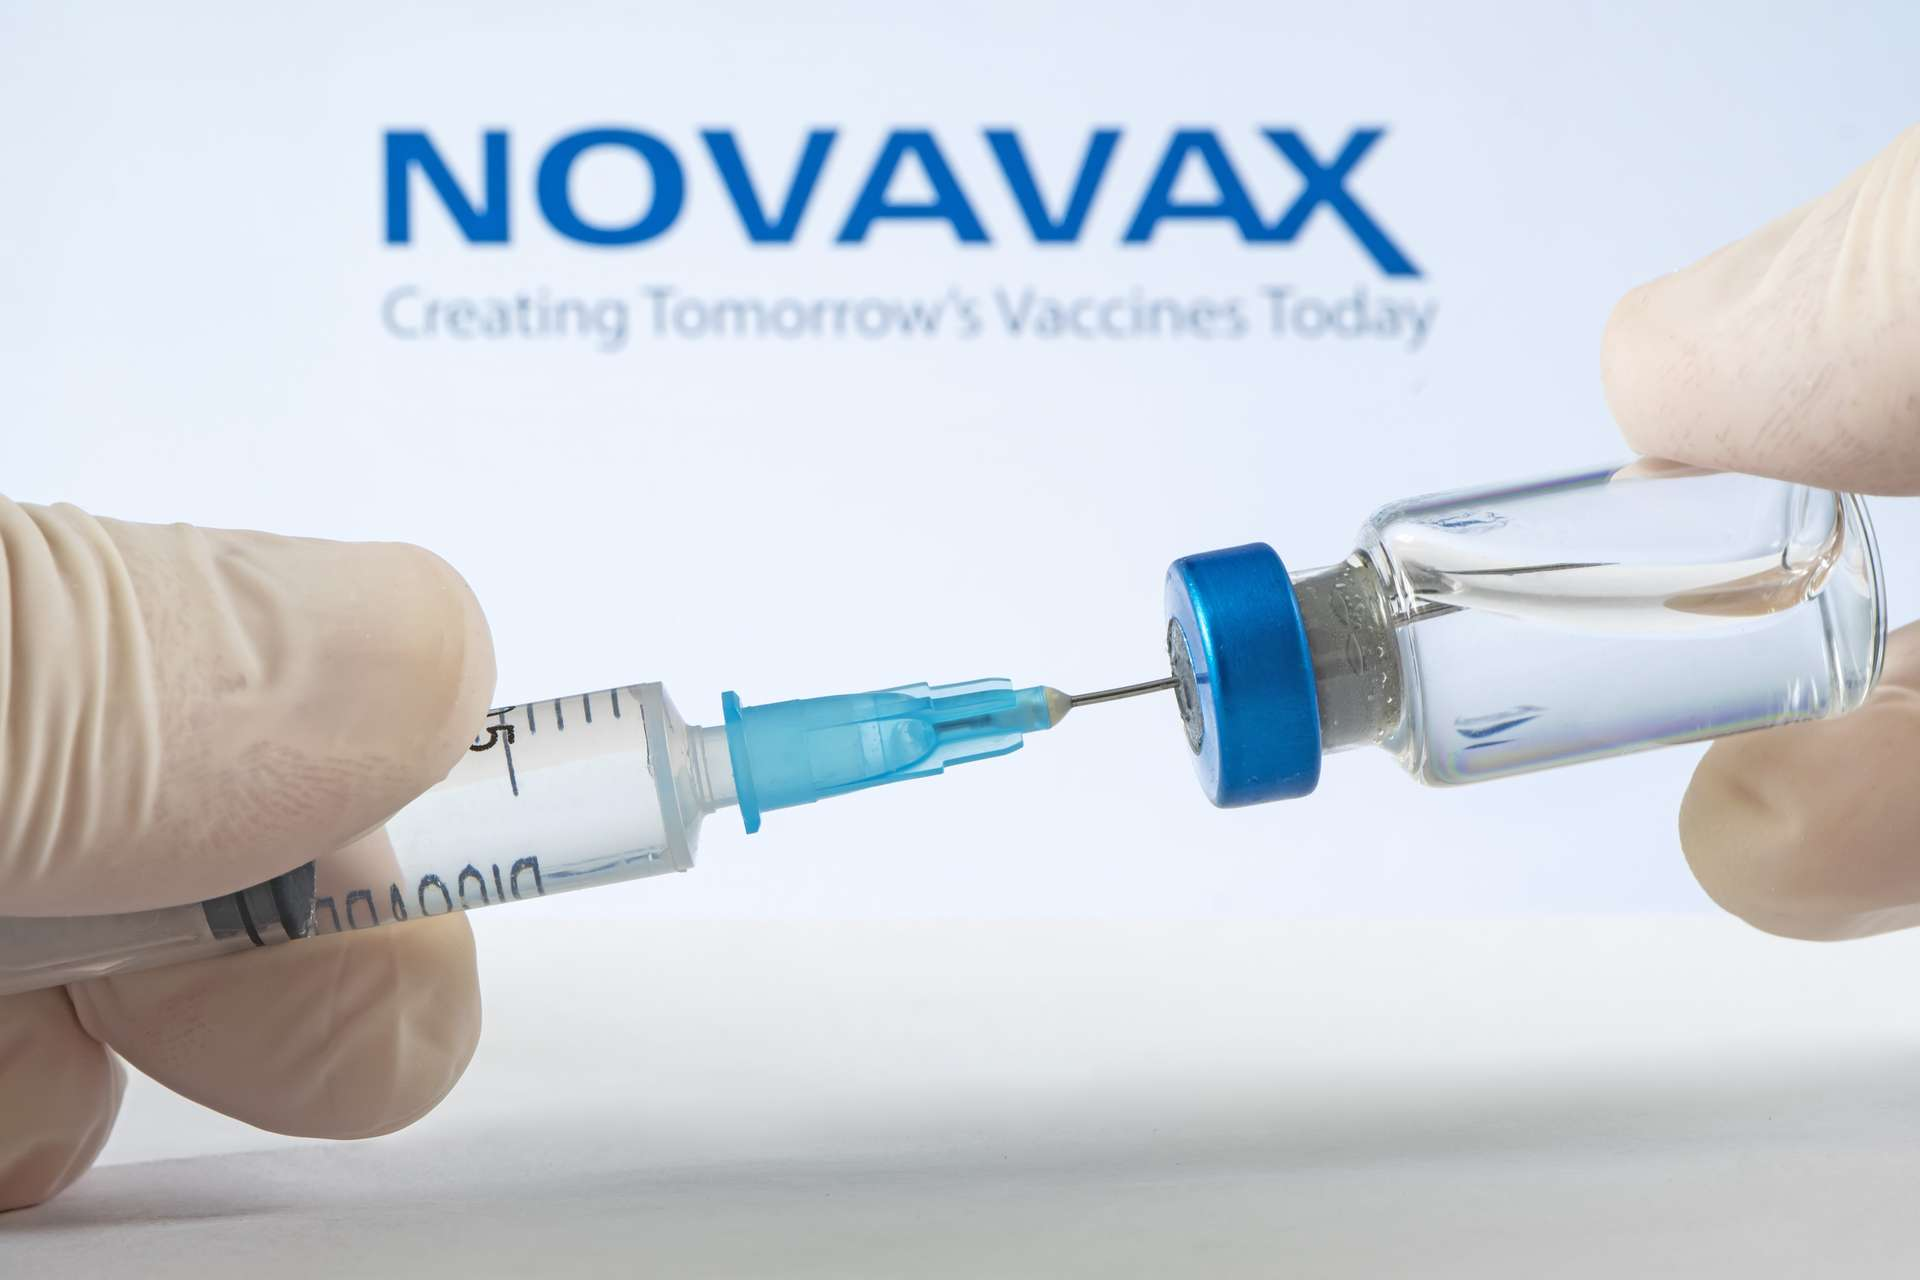 Le vaccin de Novavax est efficace à 90,4 % contre le Covid-19. © diy13, Adobe Stock